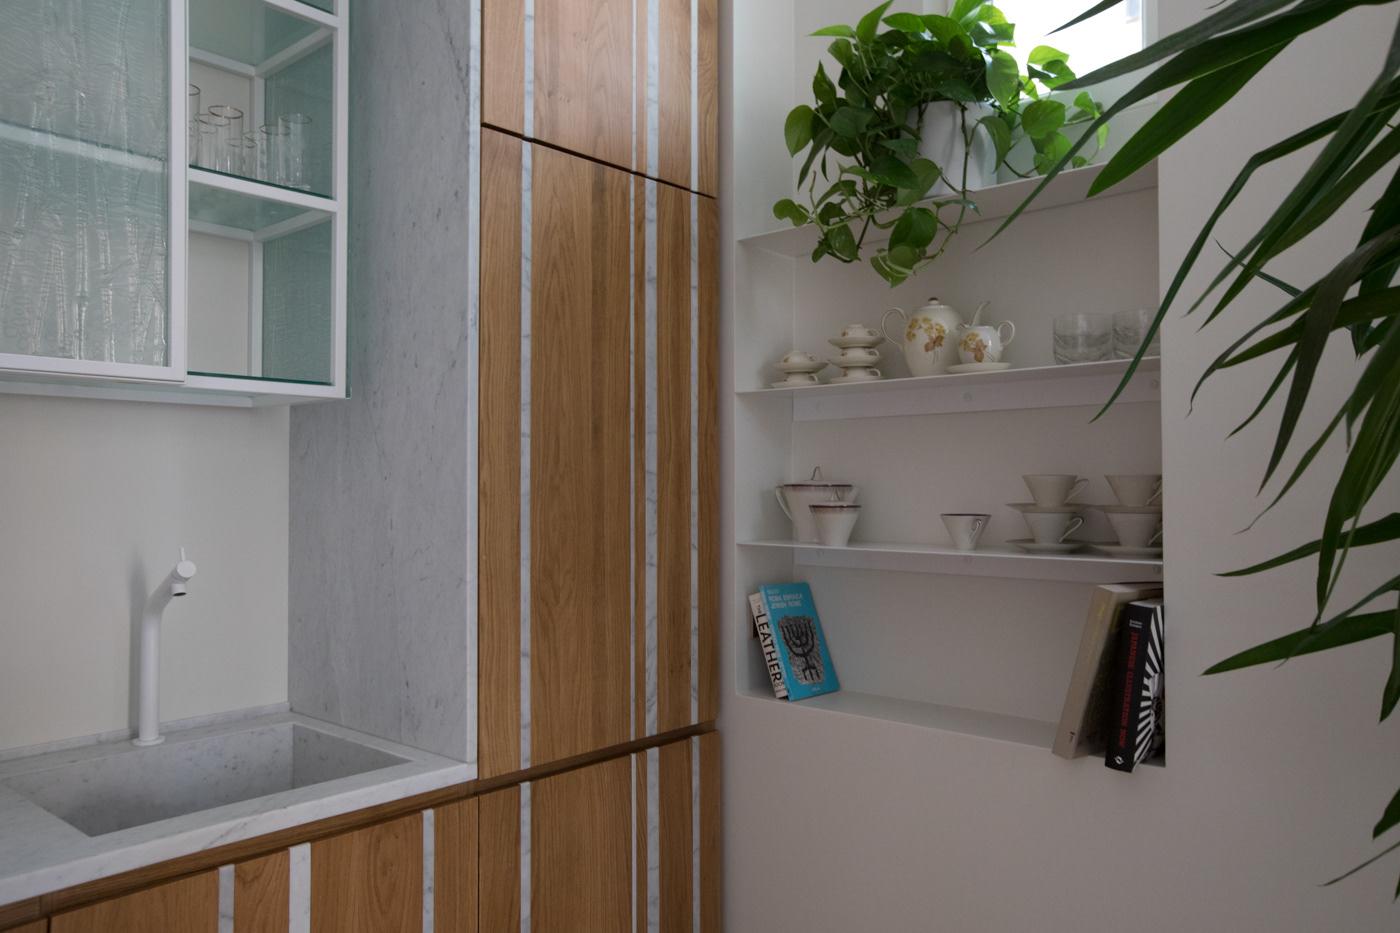 architecture interior design  Rome Trastevere turism airbnb apartment flat hosting Photography